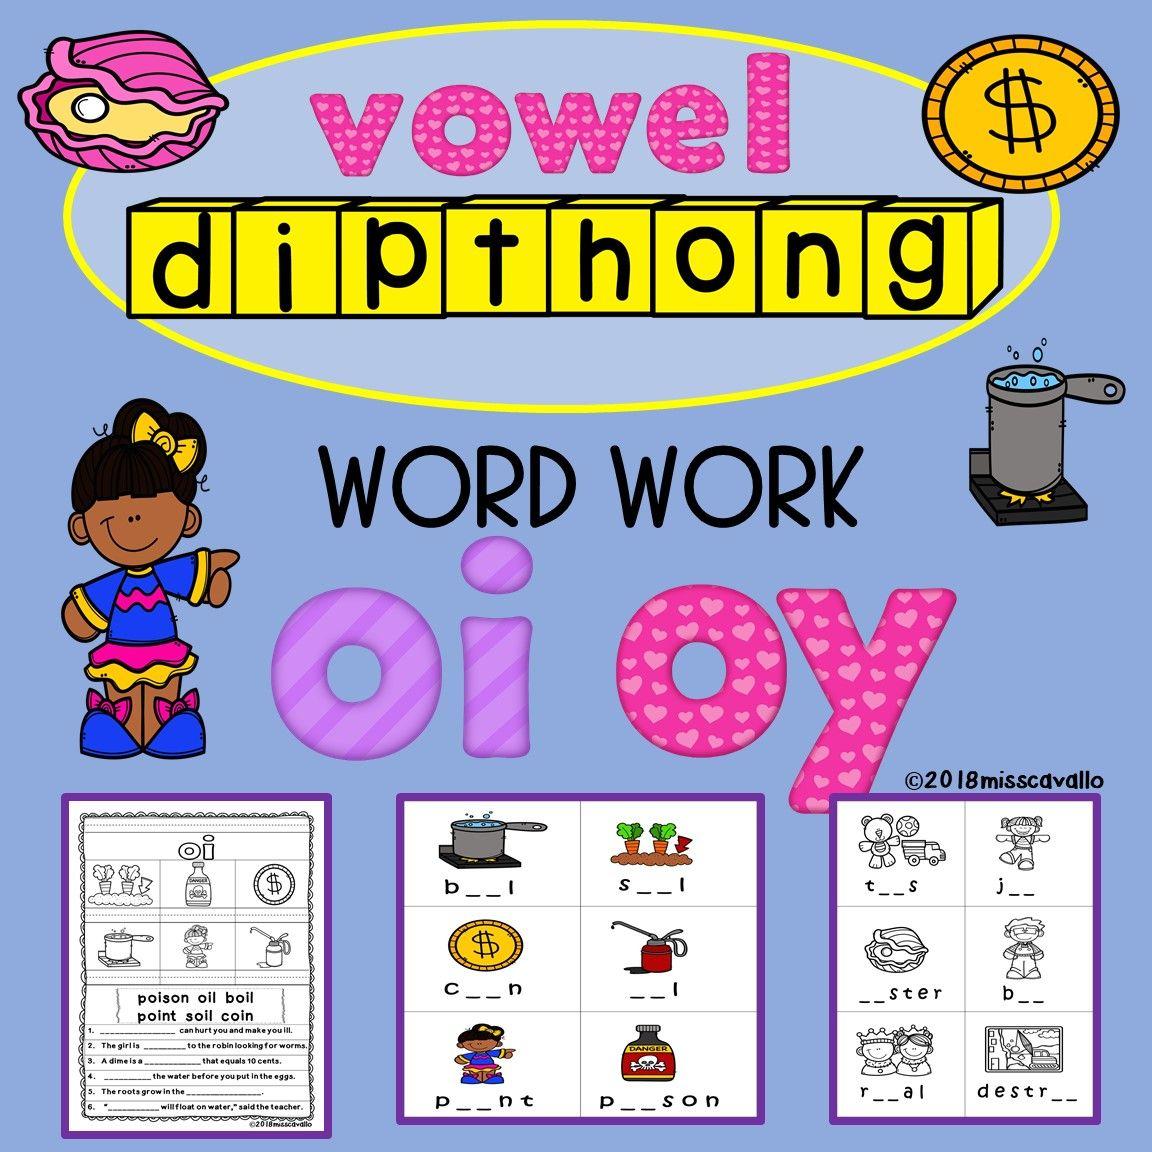 Oi Oy Word Work